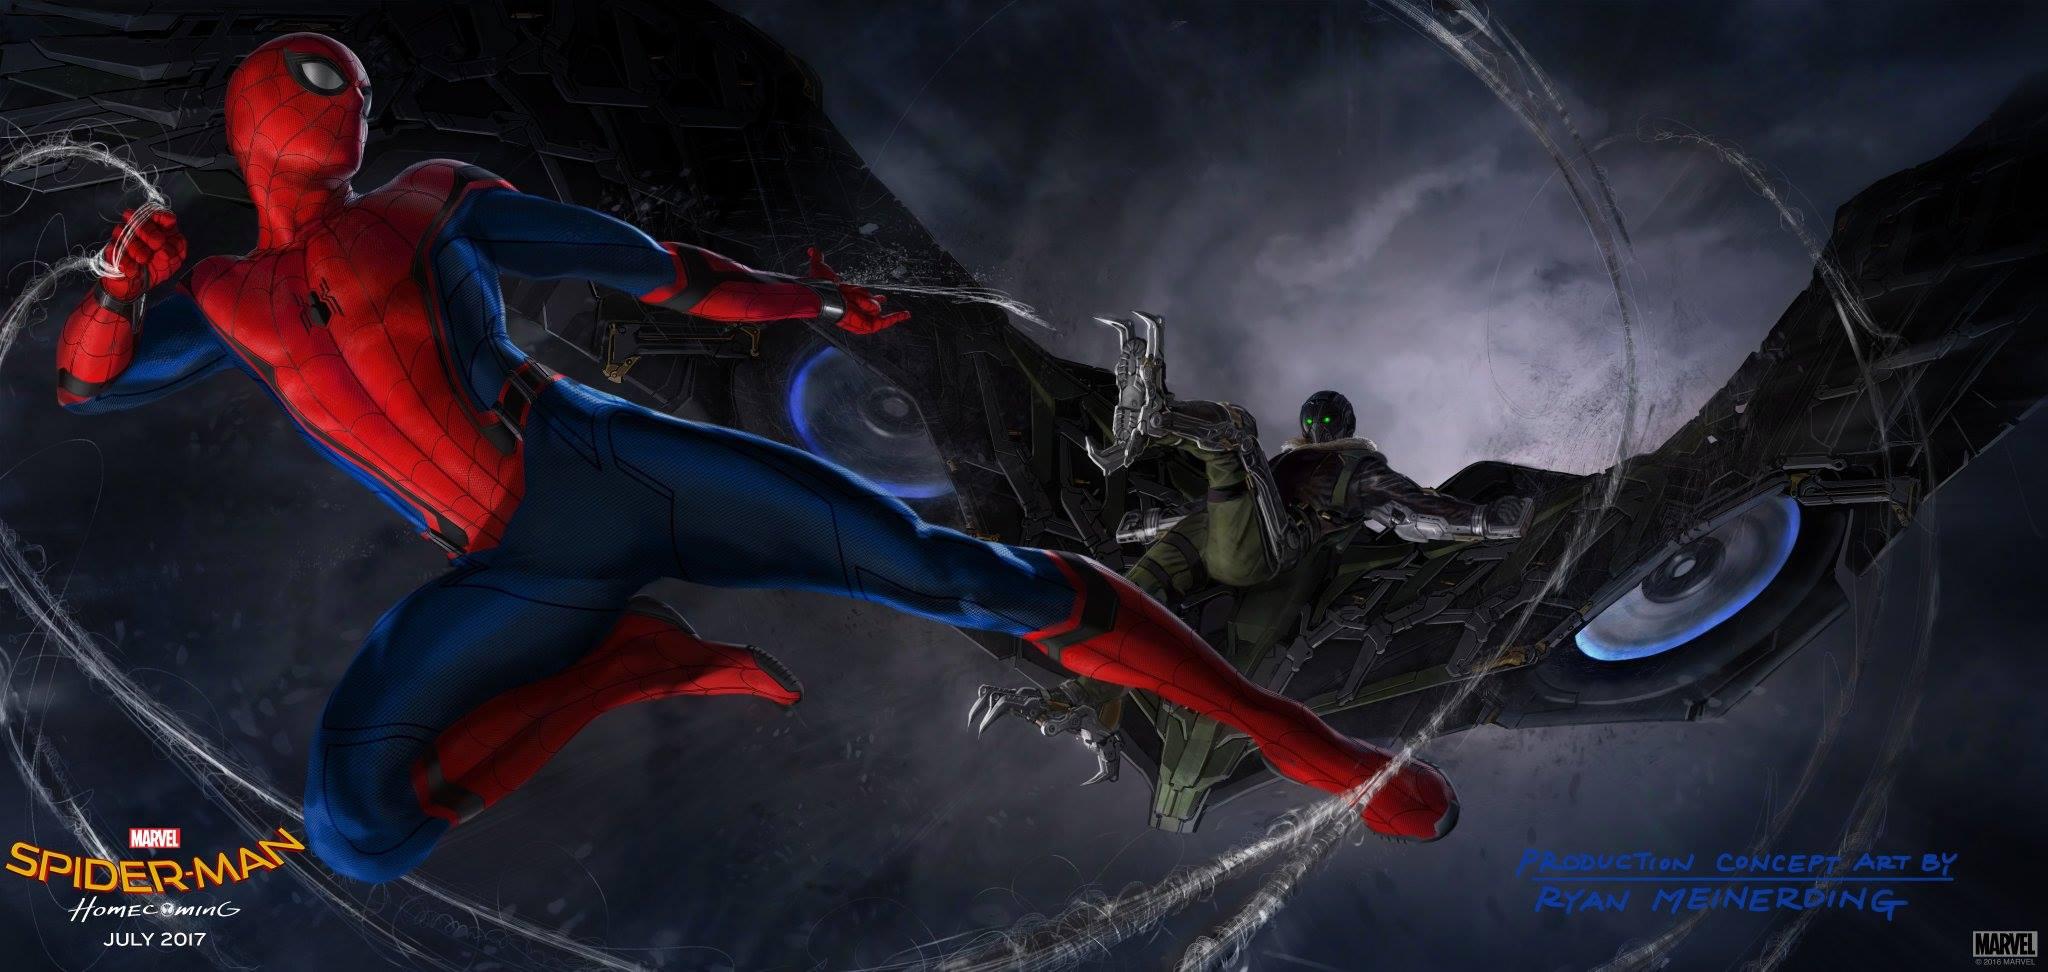 Spider-Man vs. Buitre